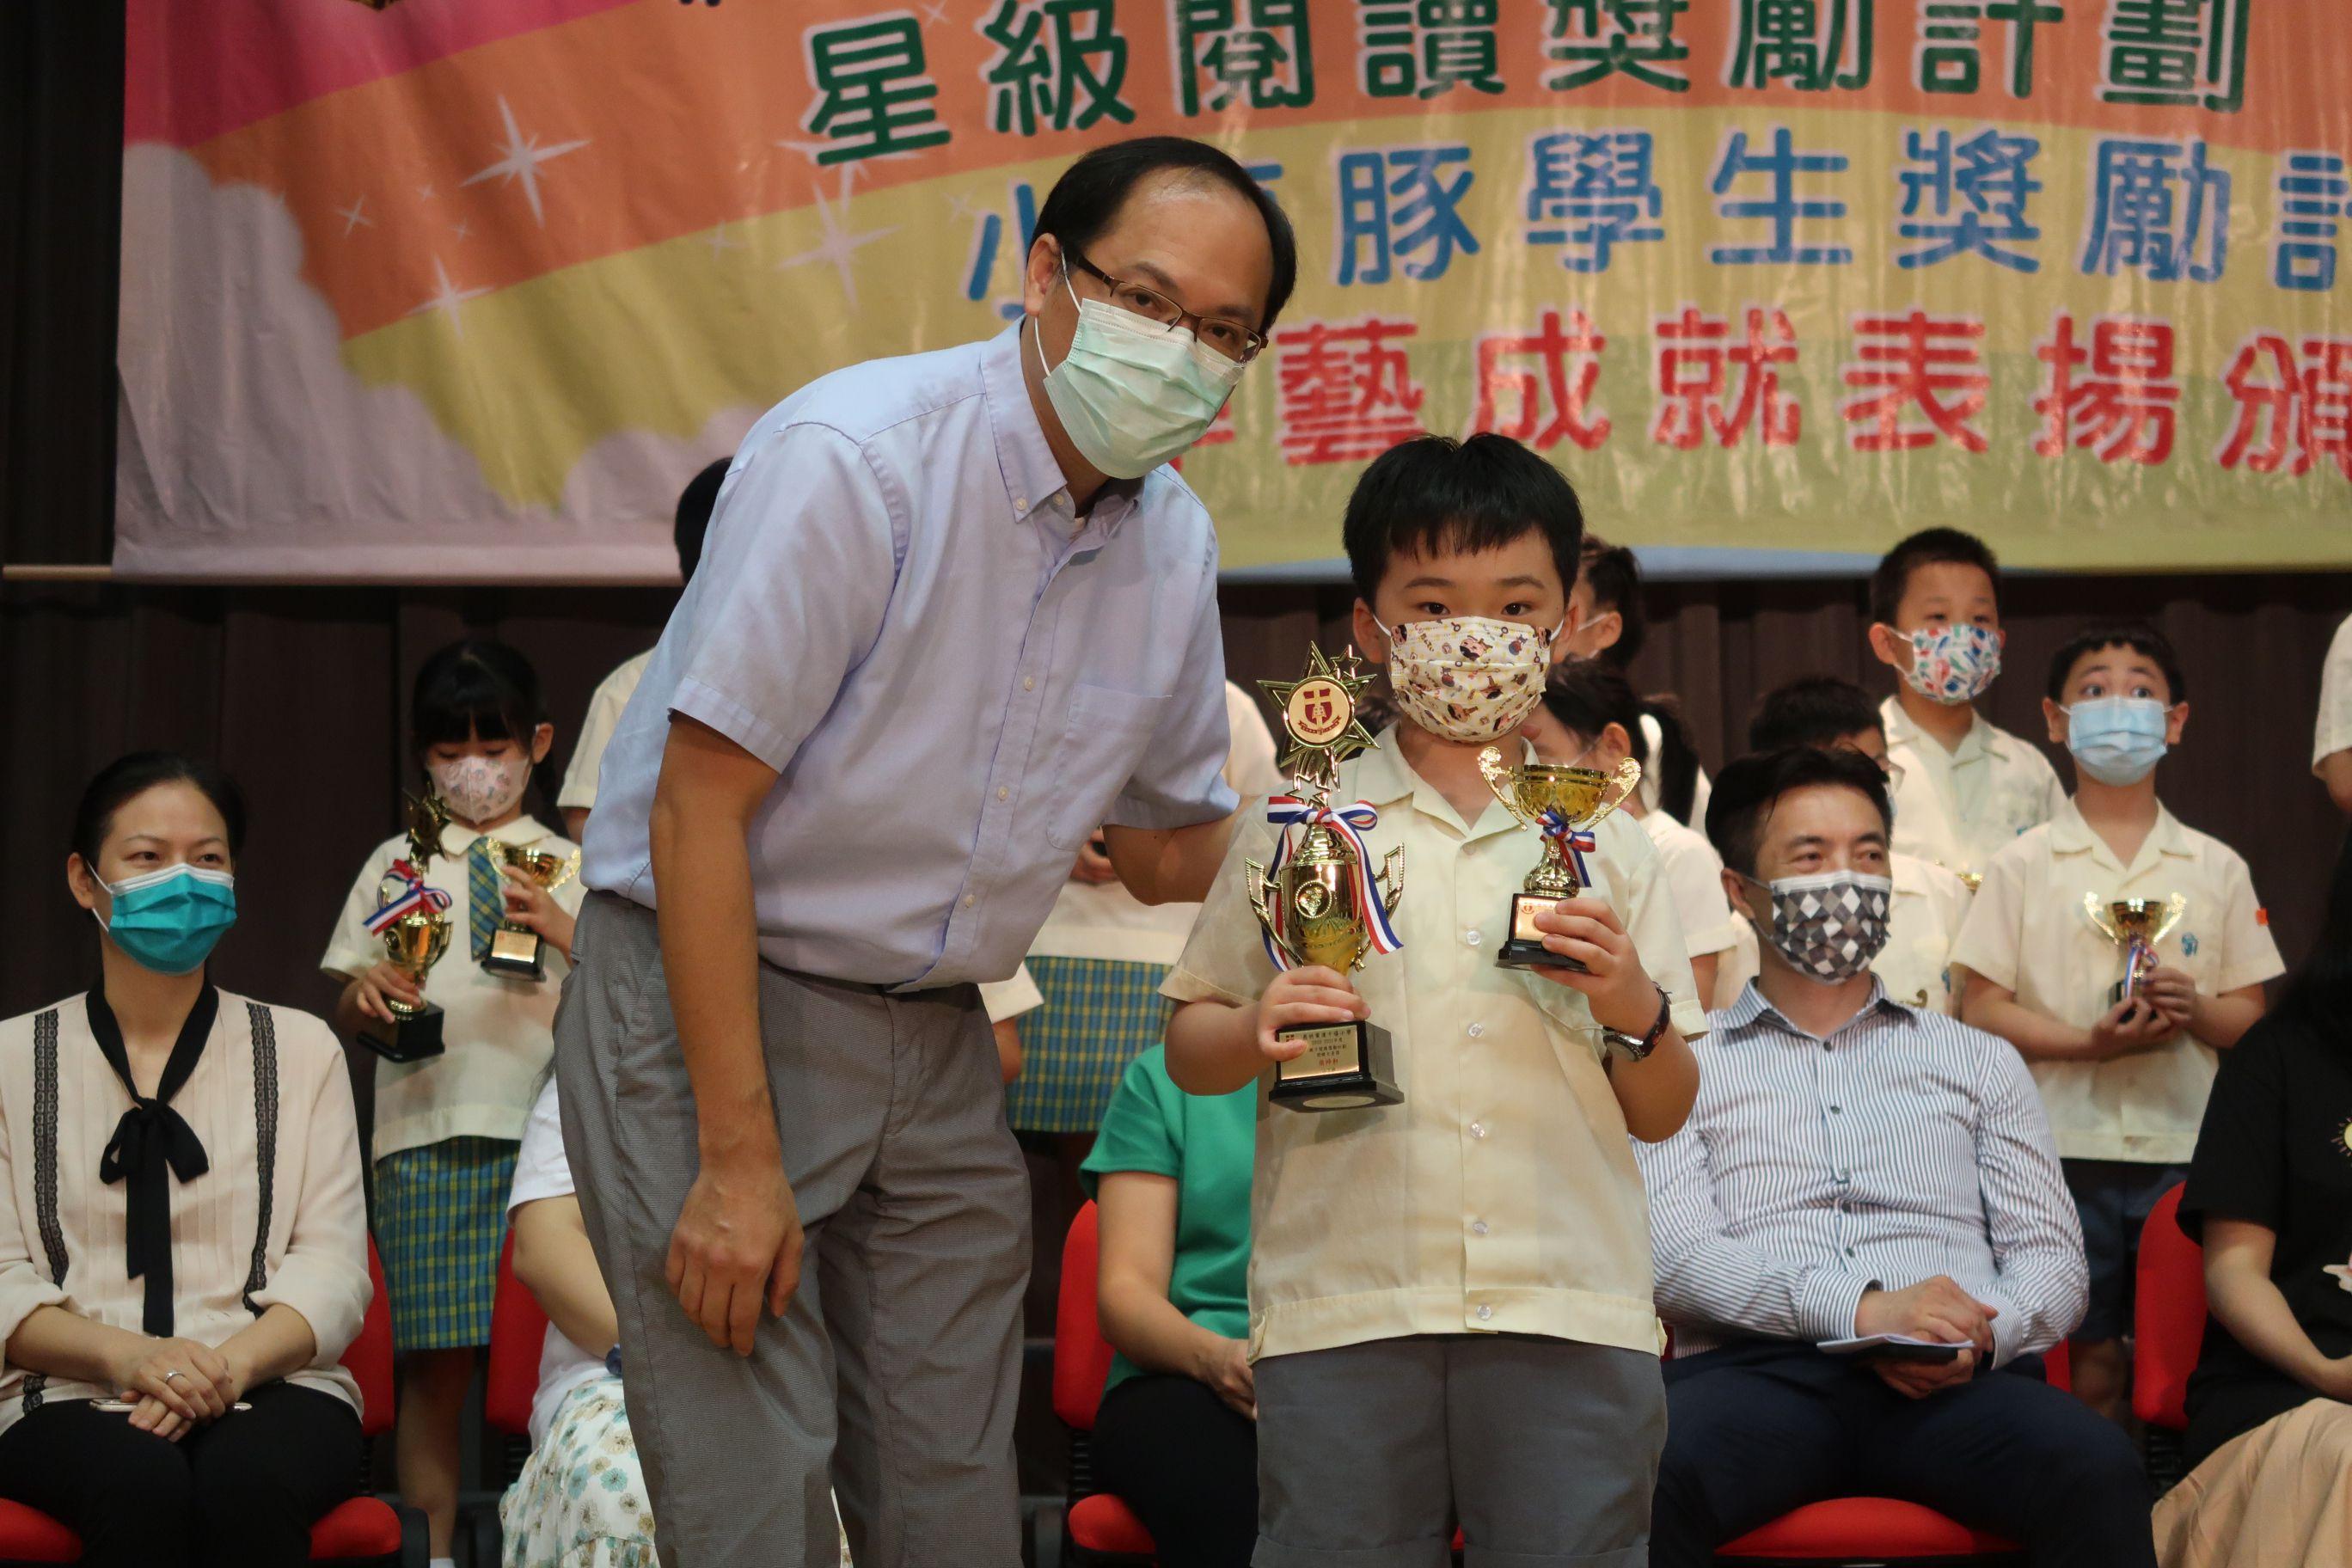 https://syh.edu.hk/sites/default/files/img_5820.jpg